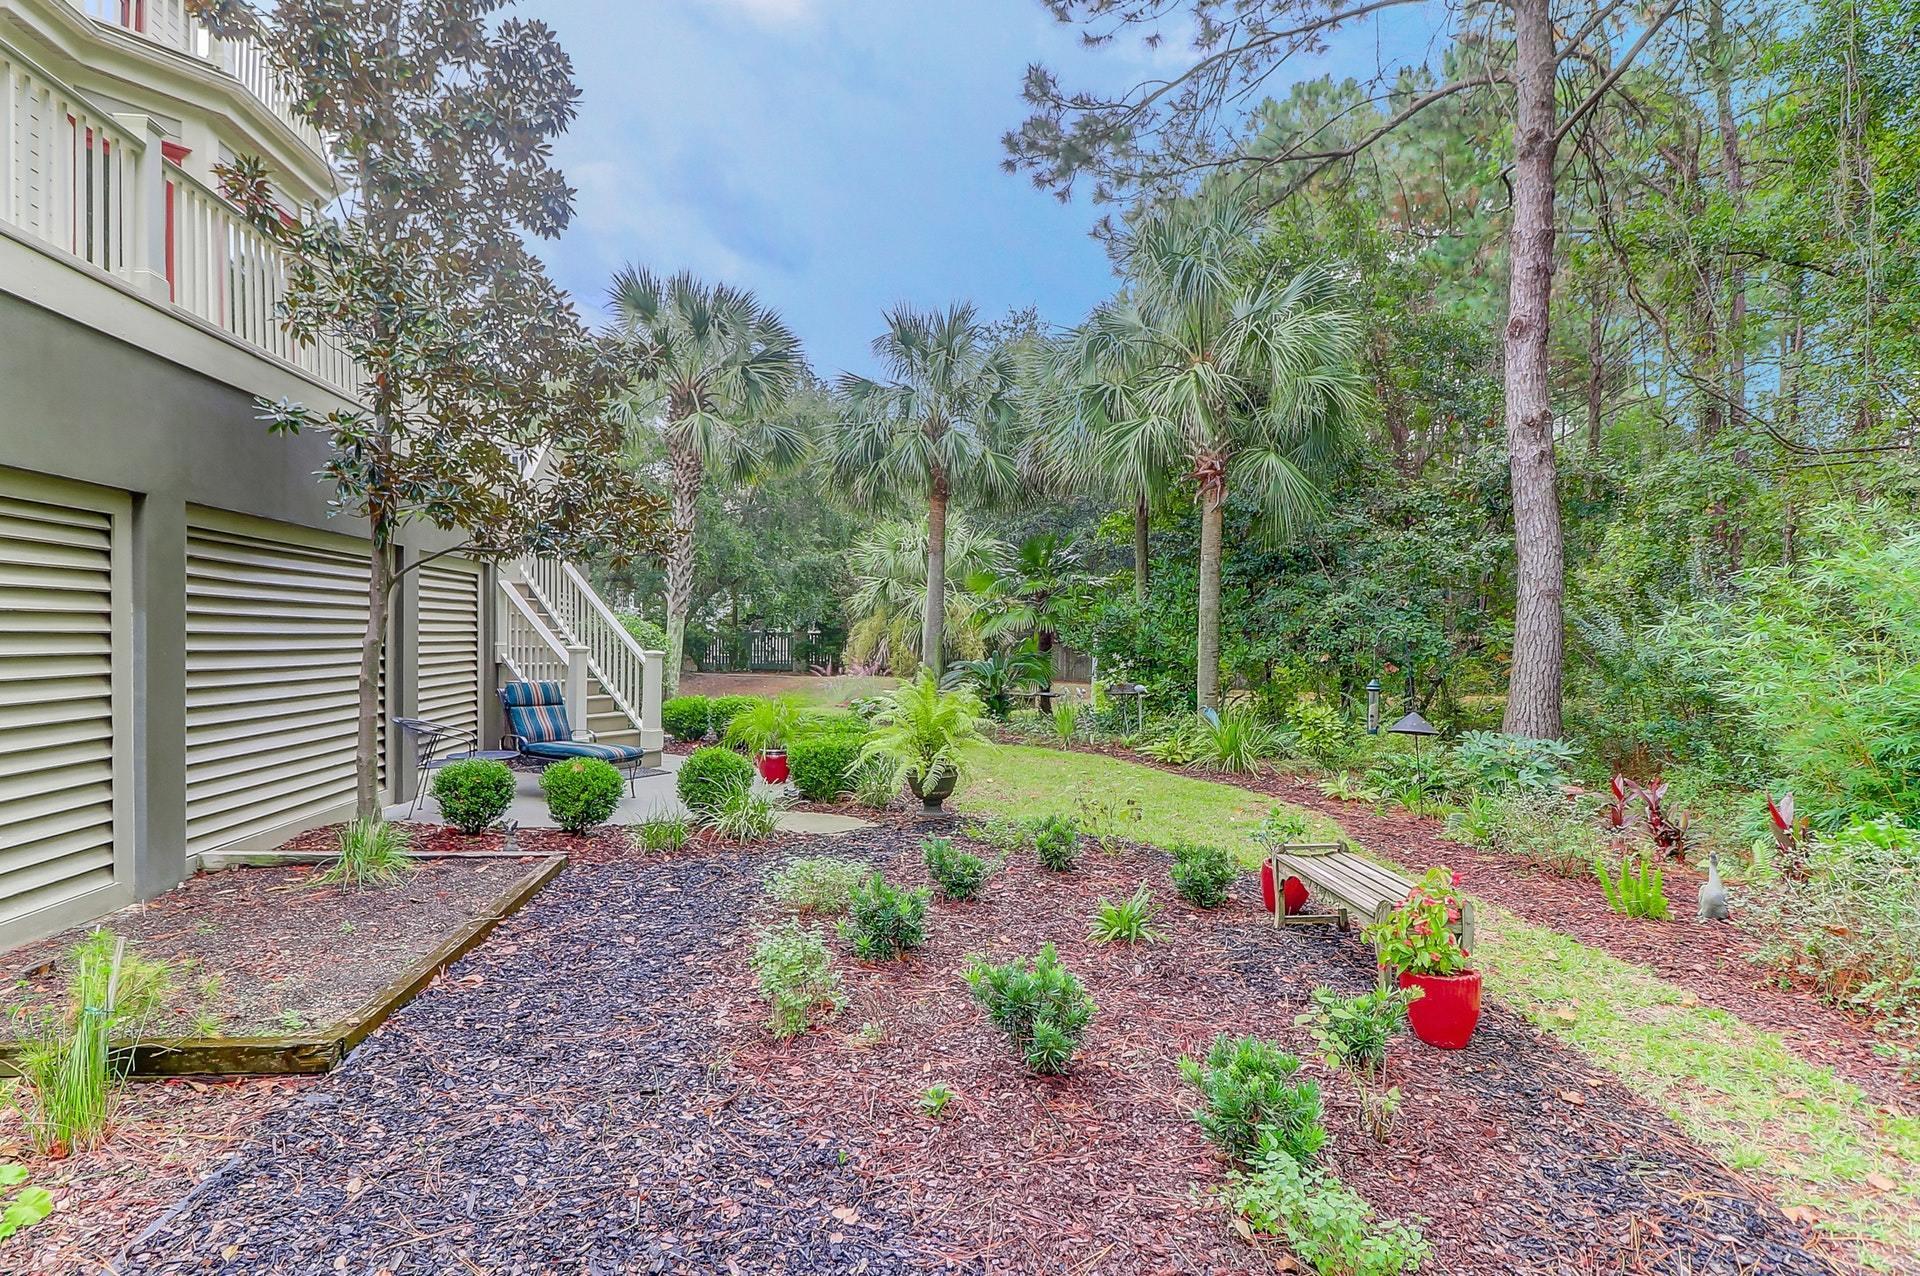 Back Bay Village Homes For Sale - 301 Indigo Bay, Mount Pleasant, SC - 4